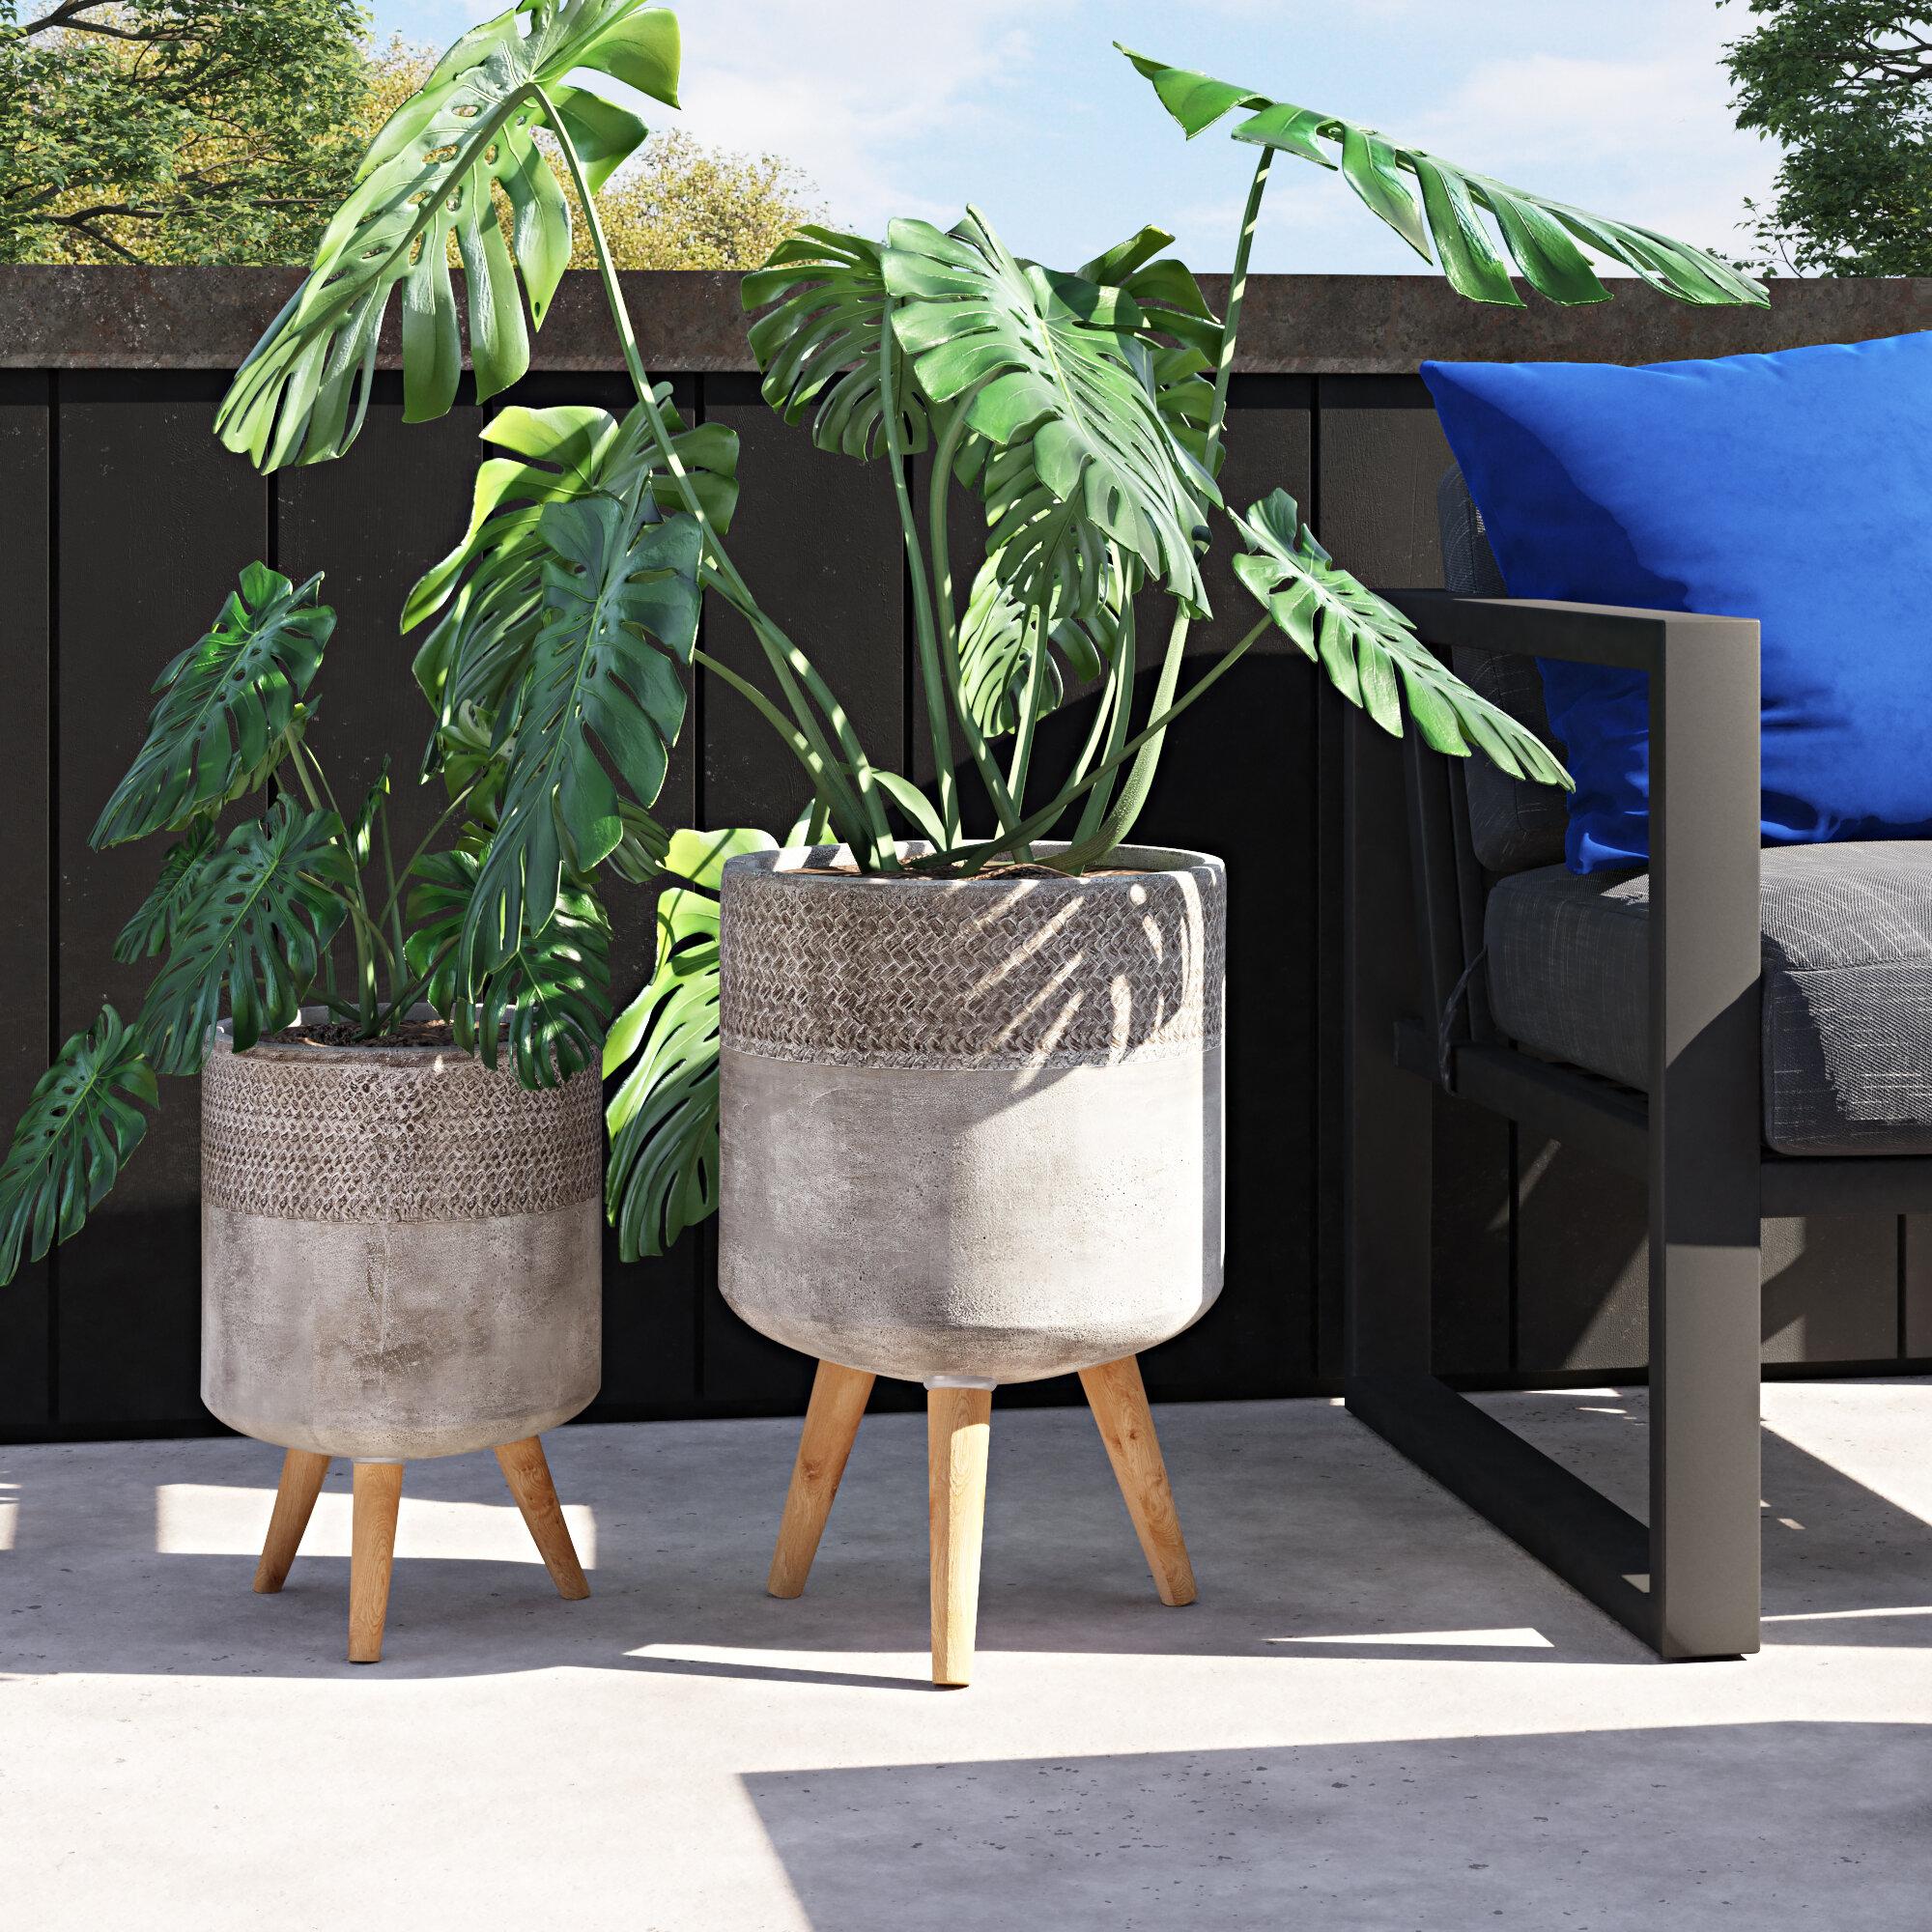 Eleada 2 Piece Concrete Pot Planter Set Reviews Allmodern